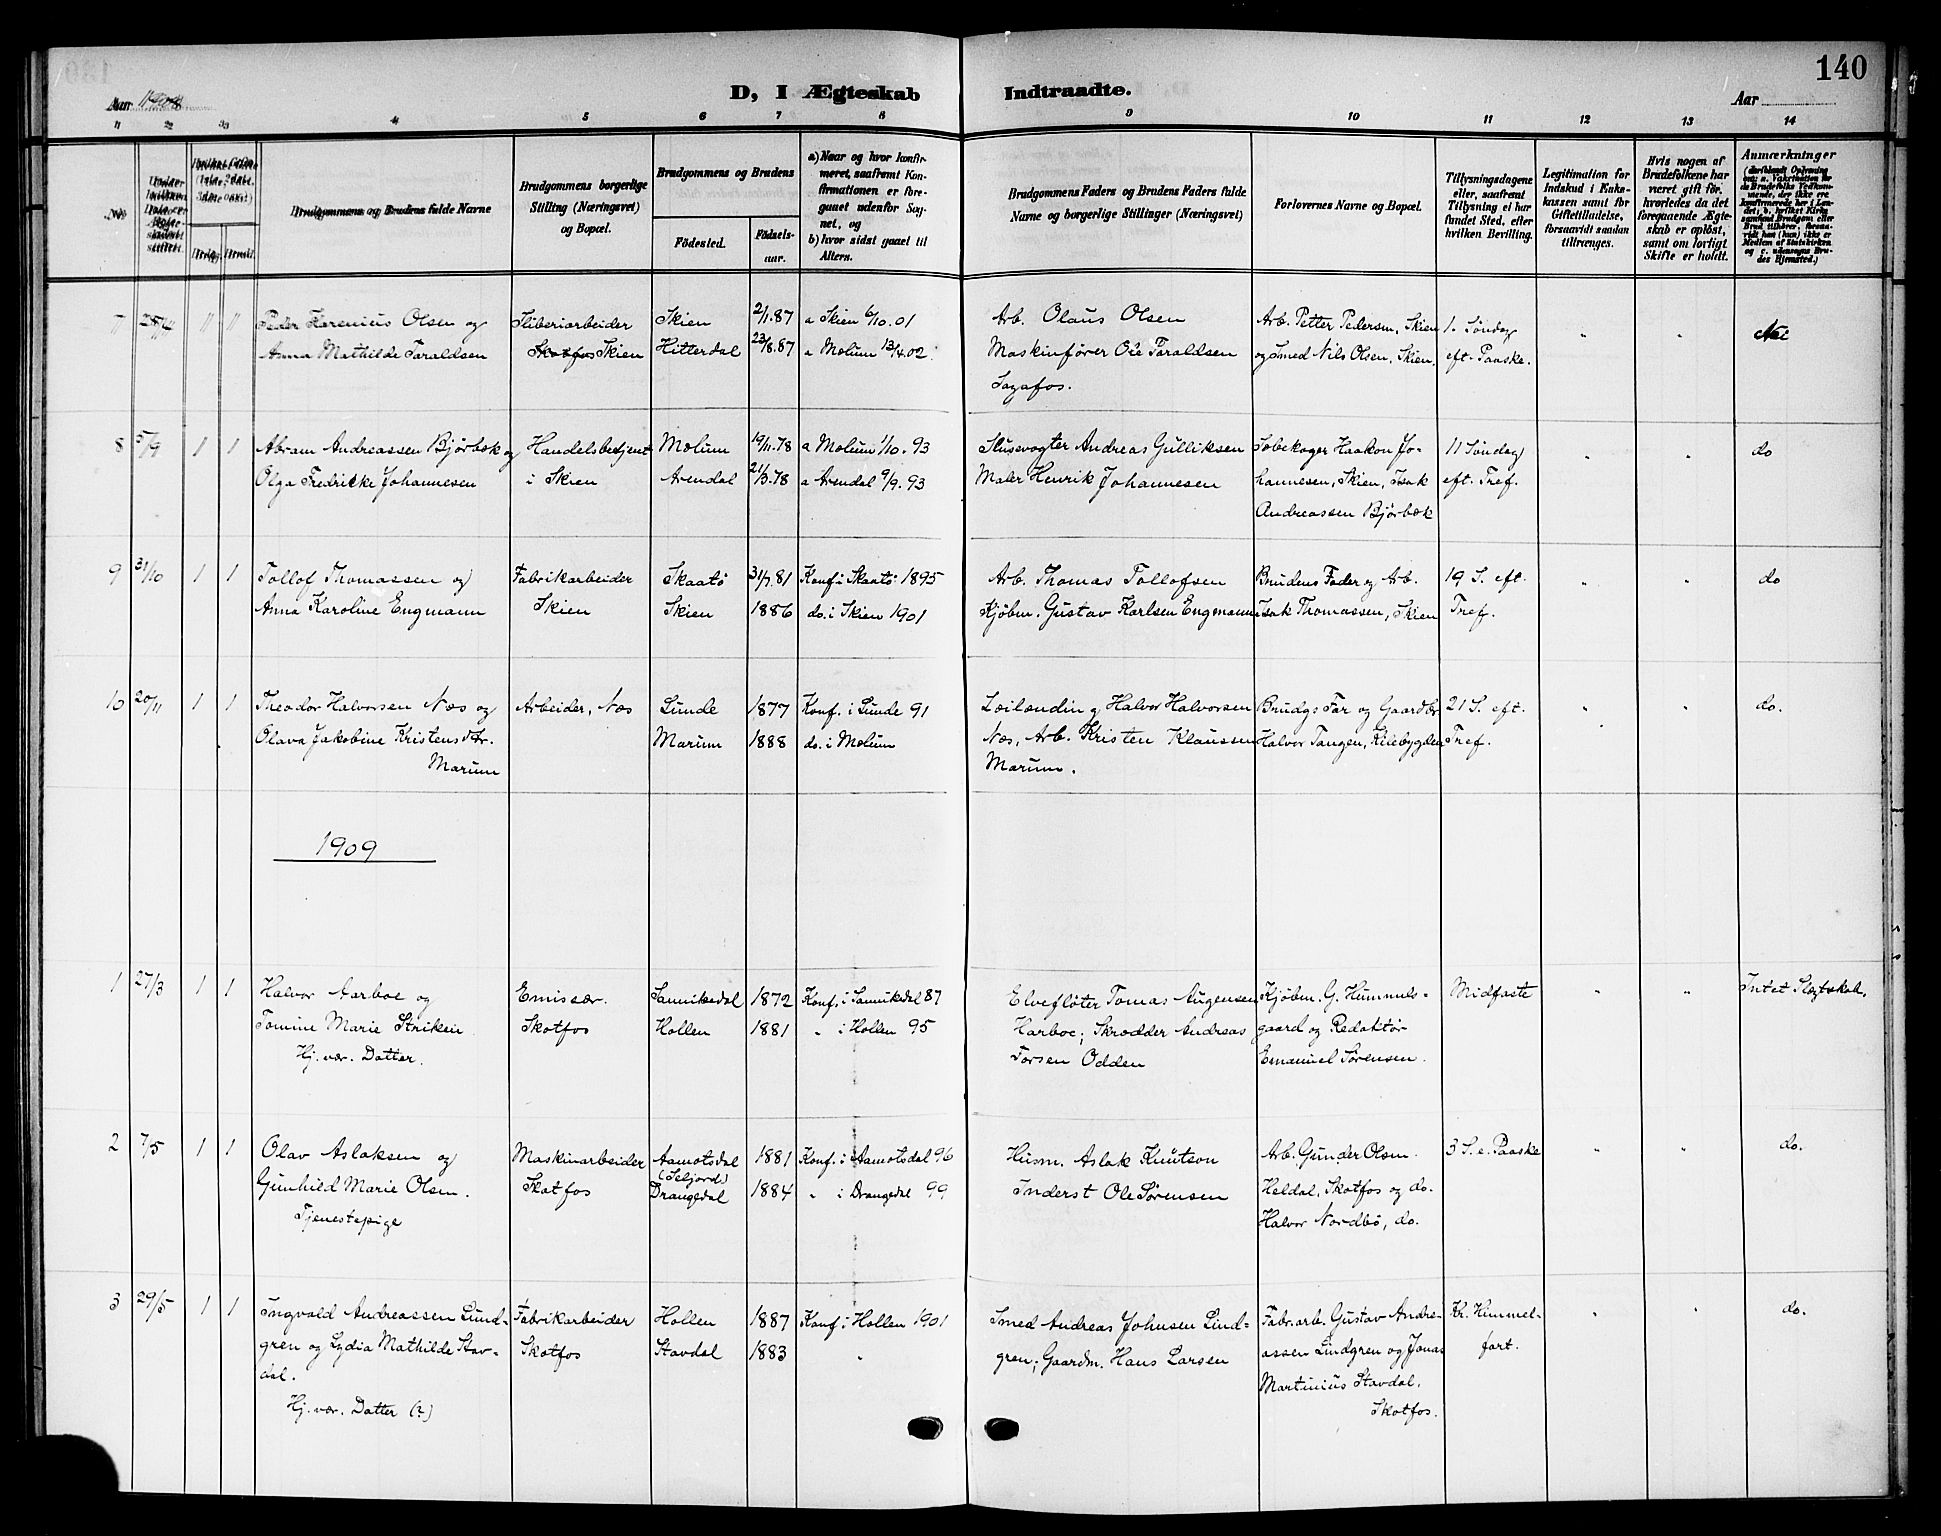 SAKO, Solum kirkebøker, G/Gb/L0005: Klokkerbok nr. II 5, 1905-1914, s. 140